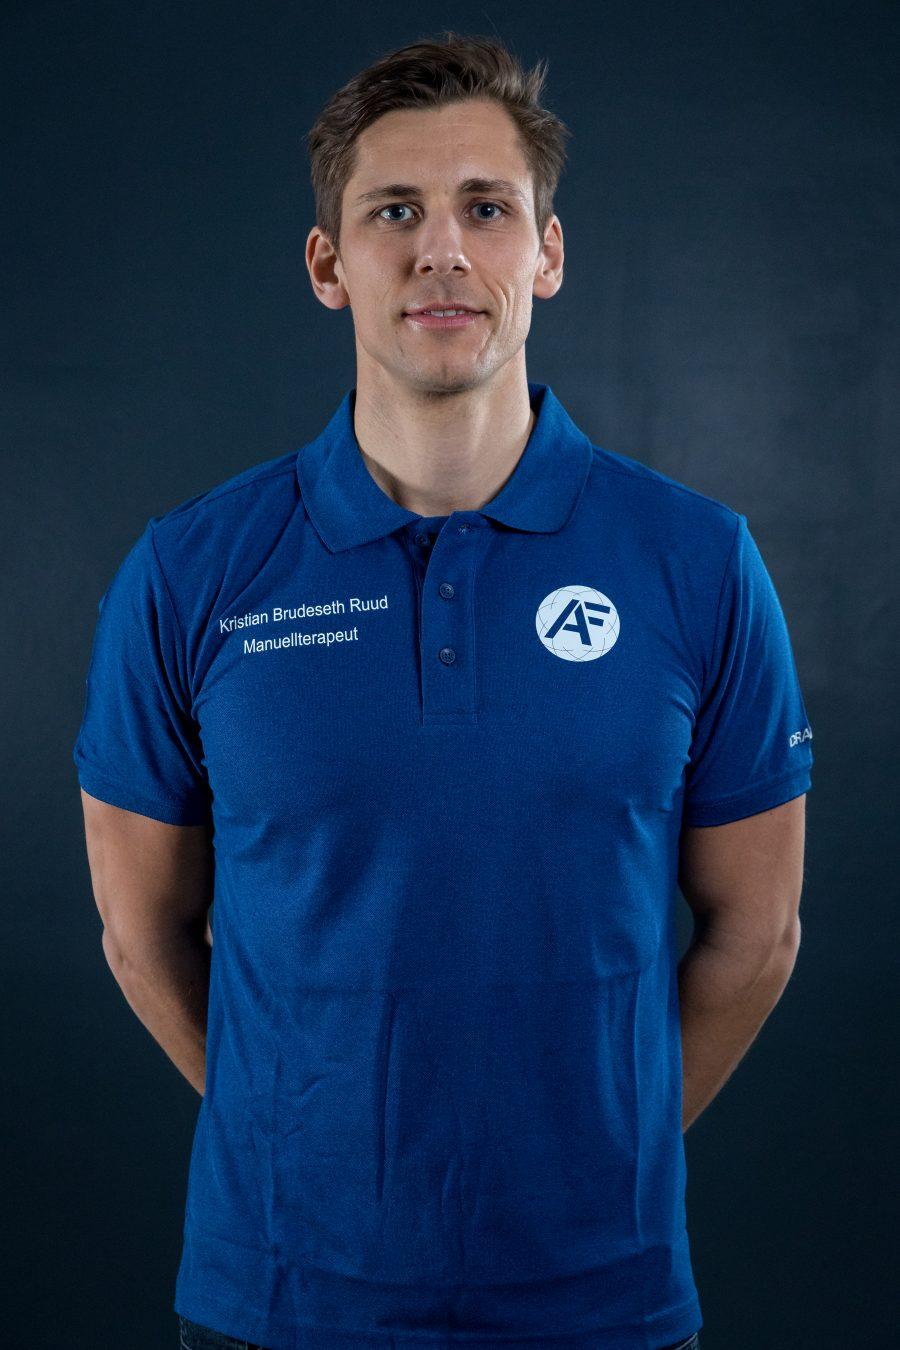 Kristian Brudseth Ruud